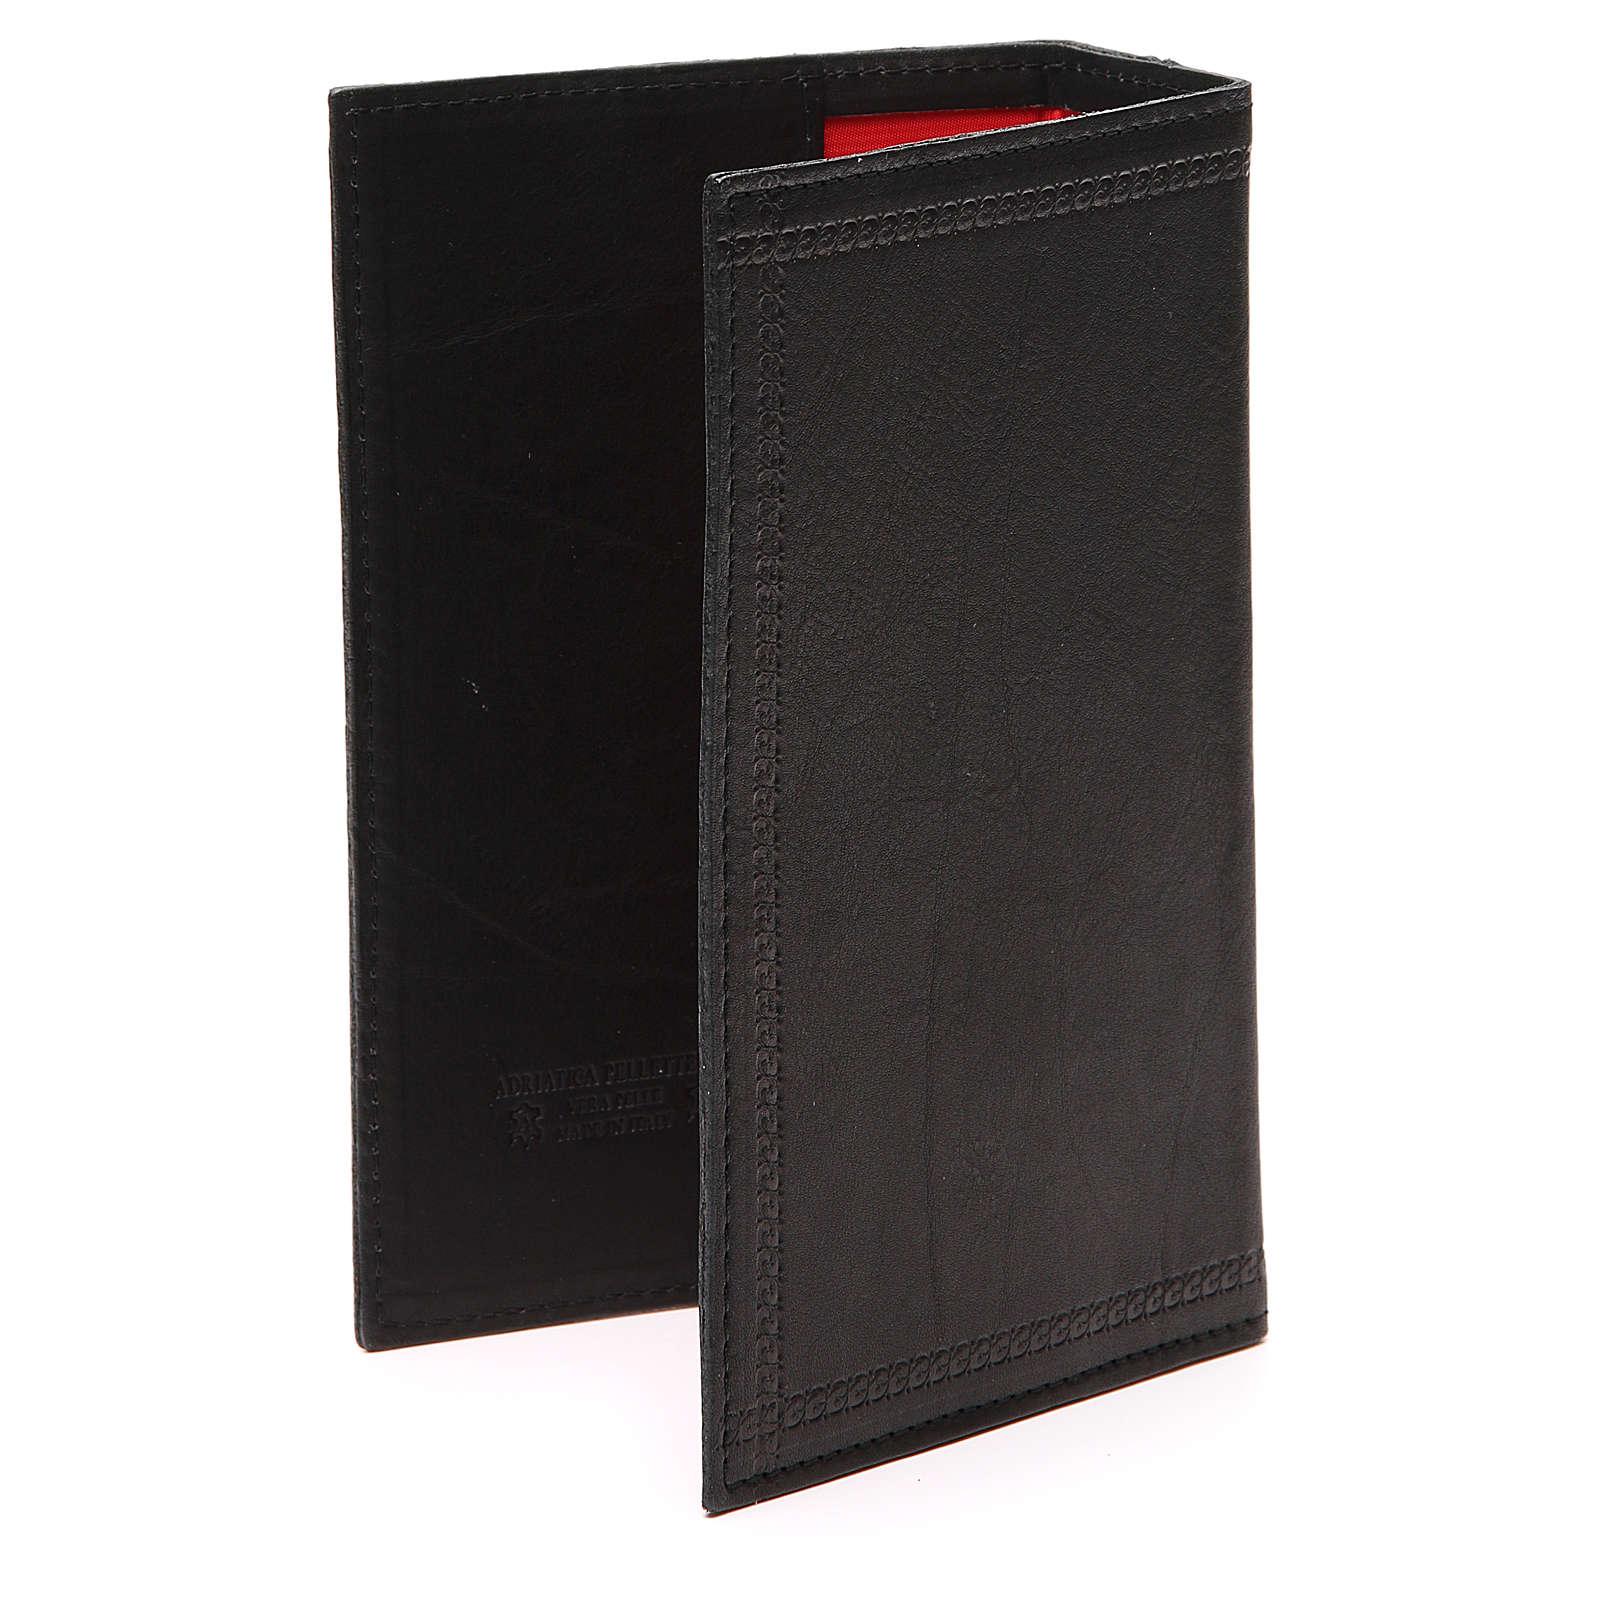 Custodia Lit. Ore 4 vol. scritta impressa pelle nera 4